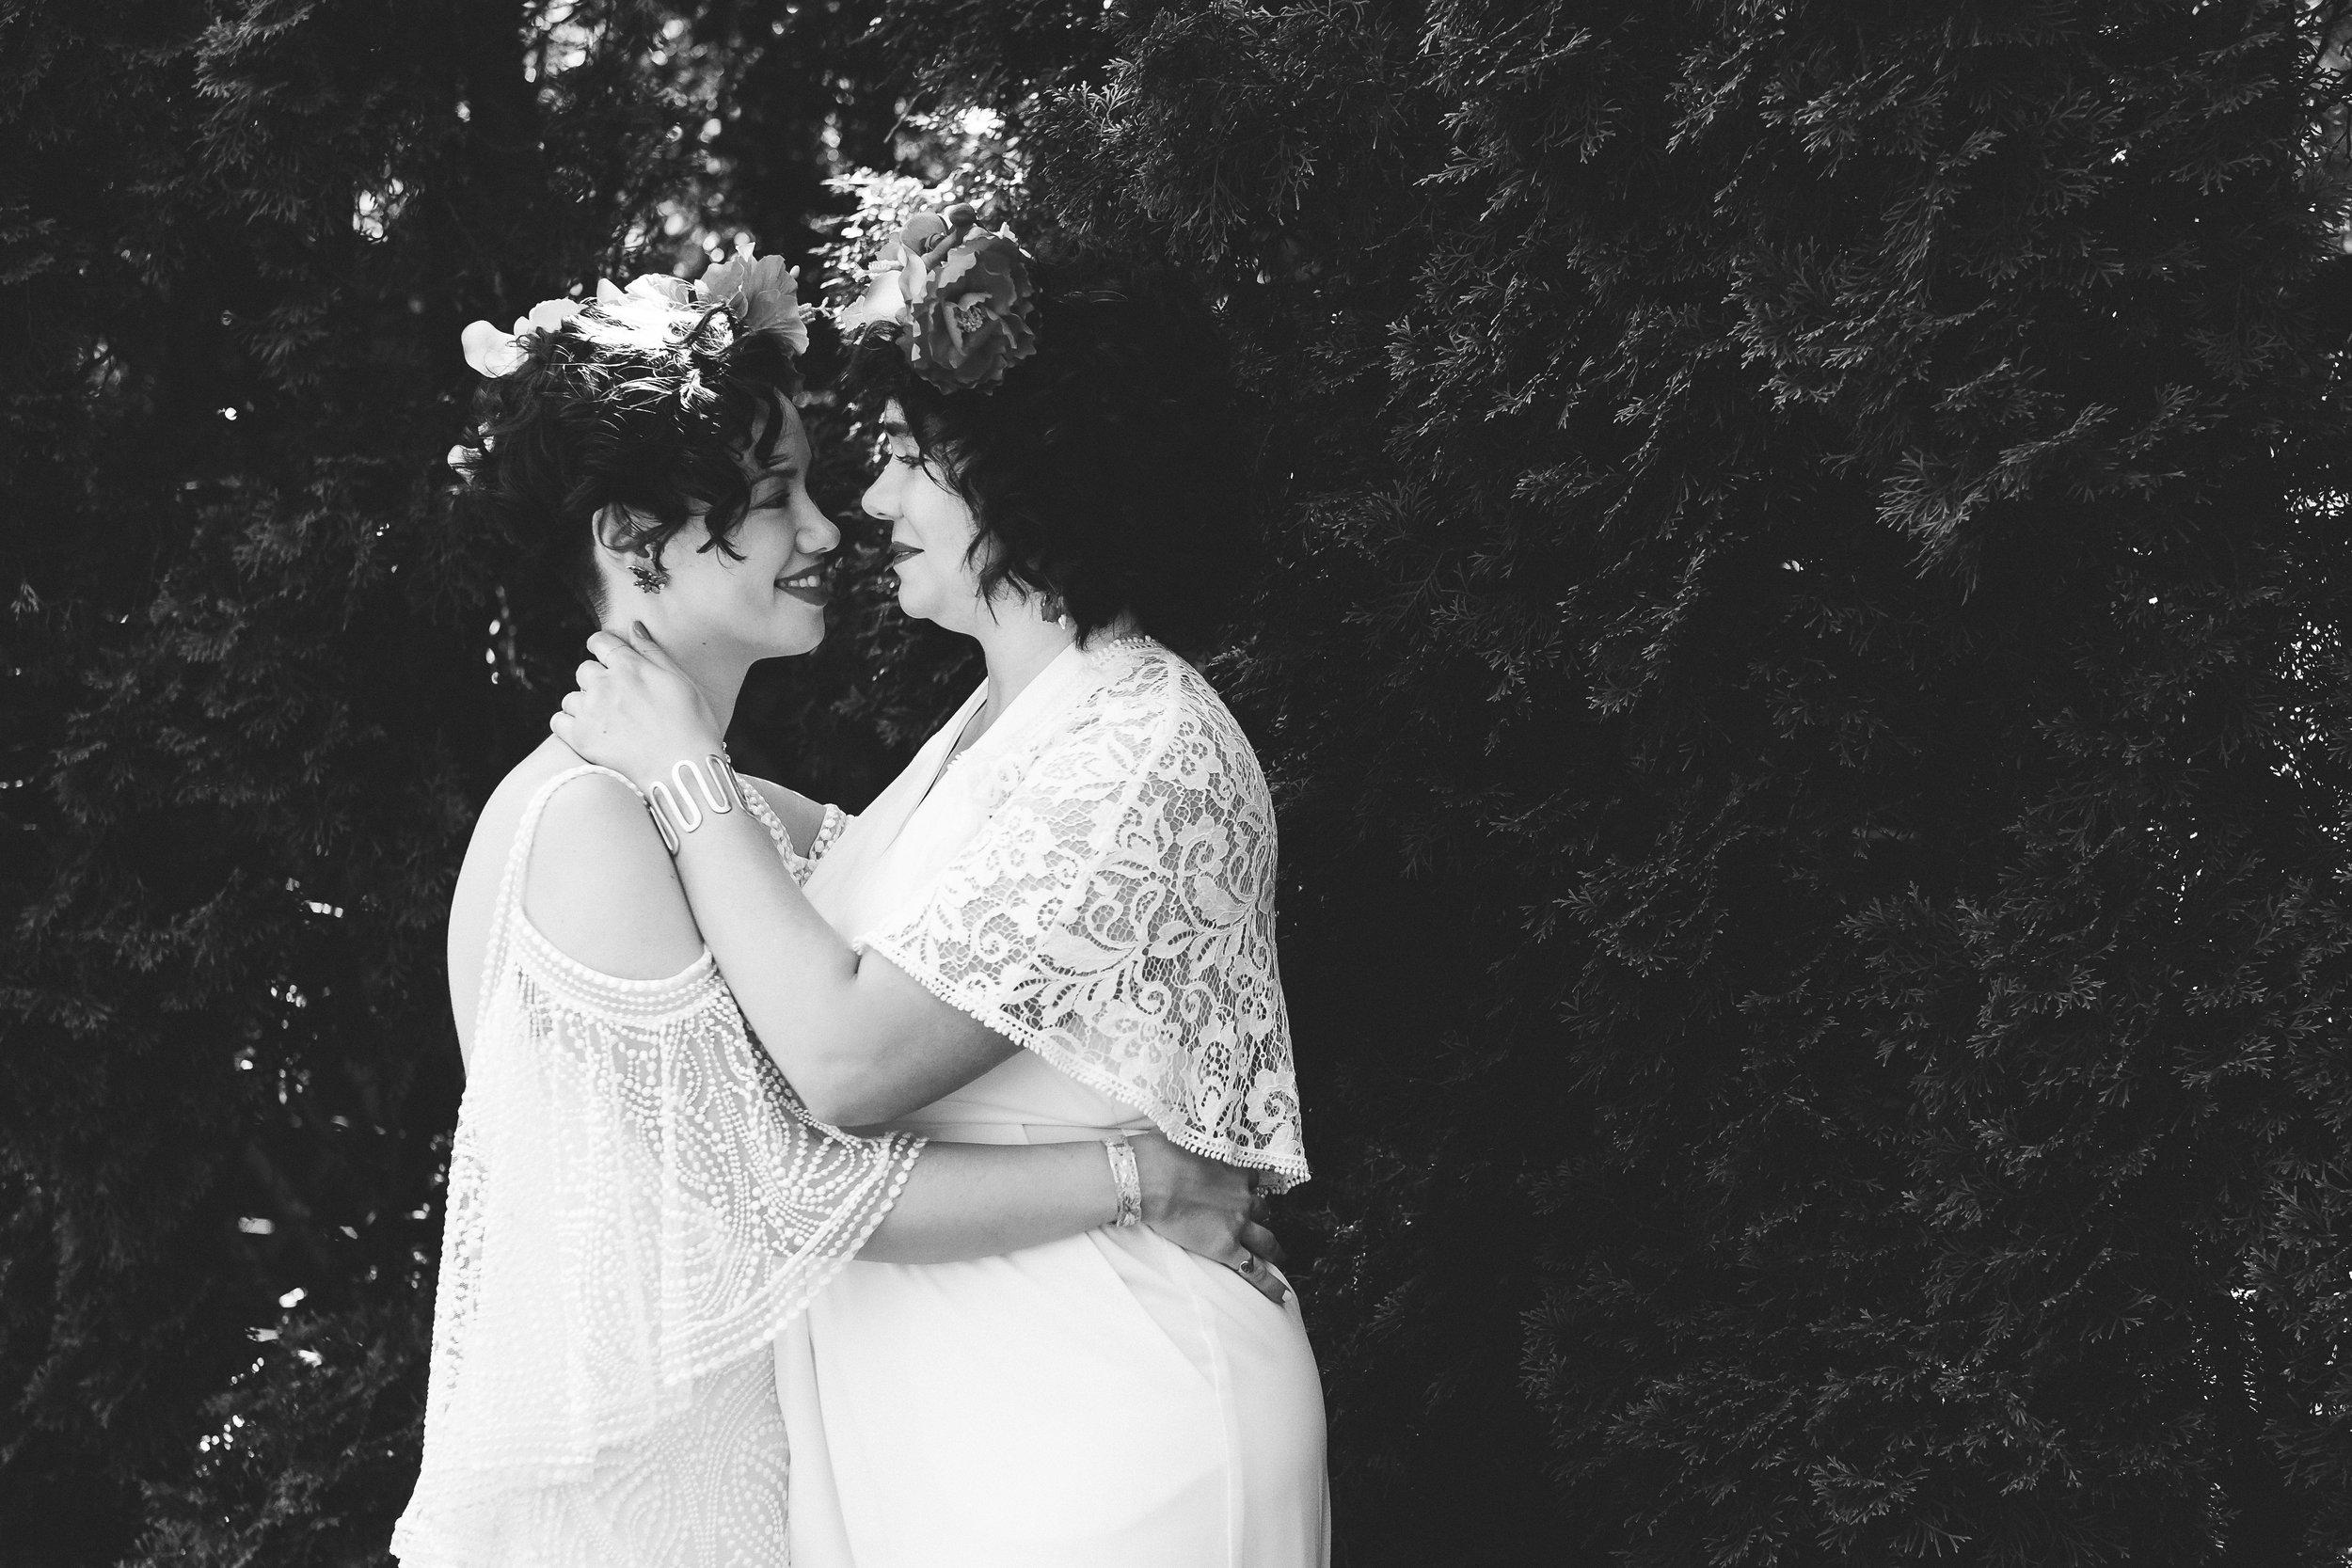 WSPCo-06302018-Doreen-Danielle-Wedding-Sneak-Peek-18.jpg